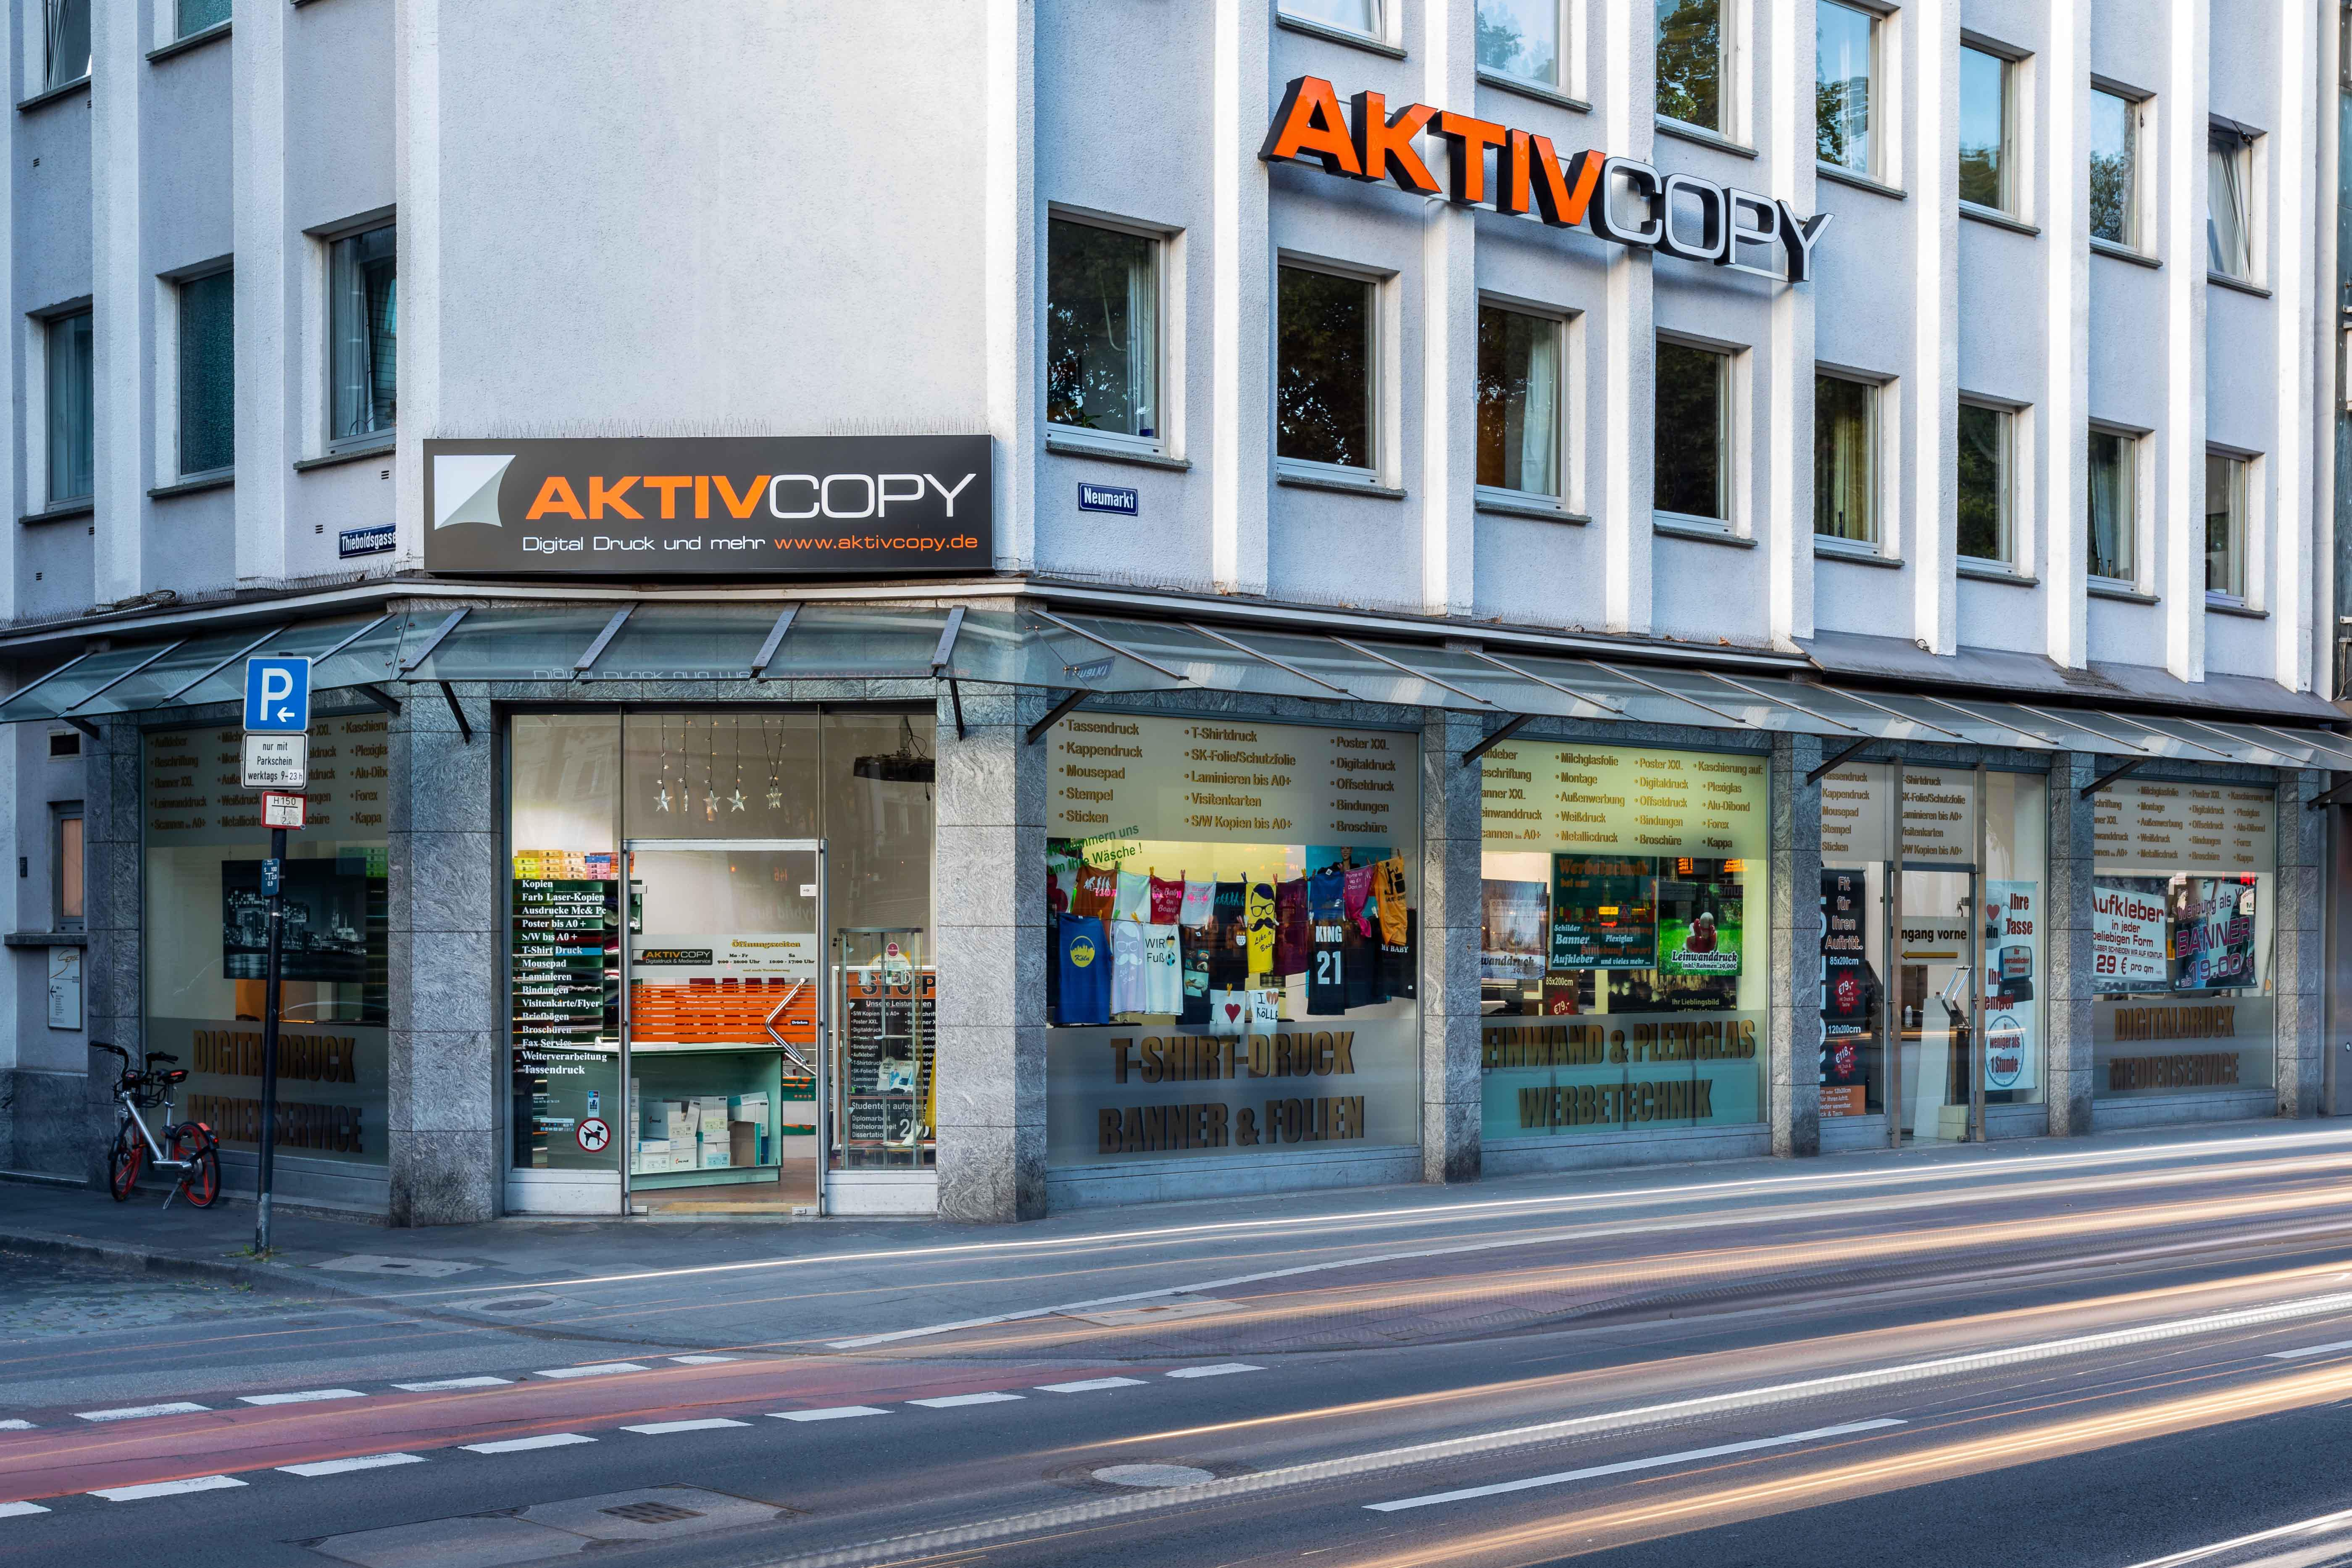 Copyshop Köln Aktivcopy Digitaldruck Köln 3 Bewertungen